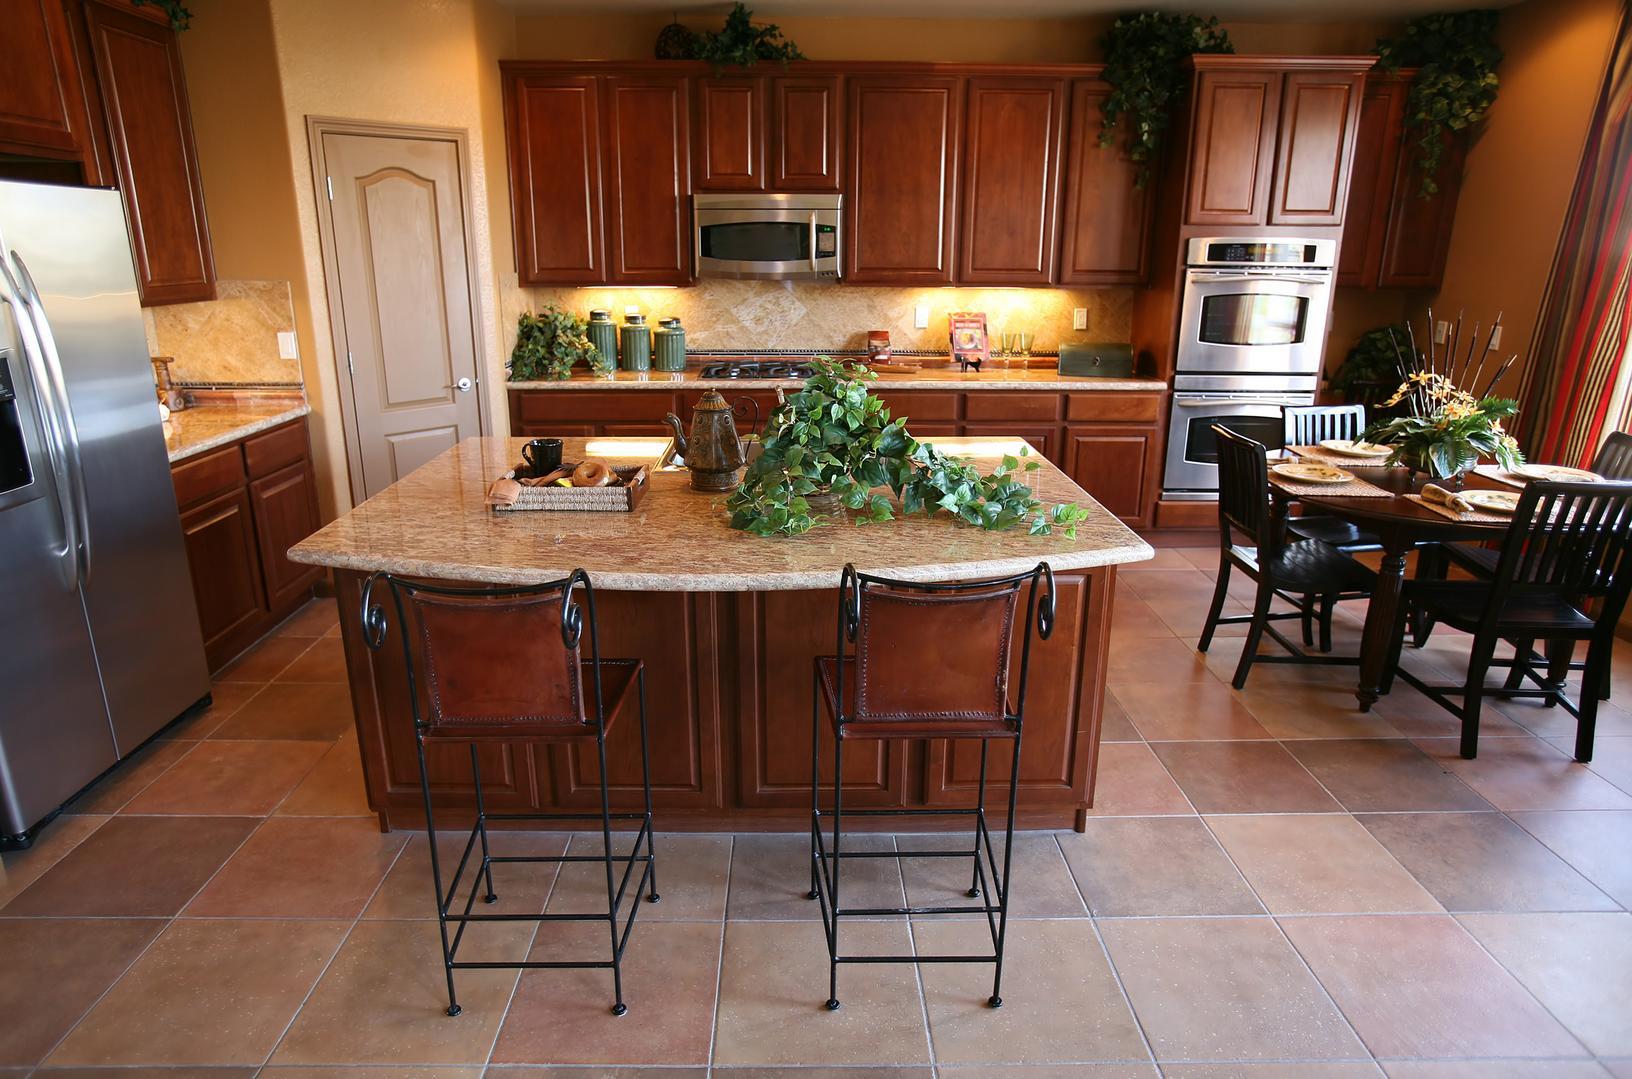 Quakertown Kitchen Reface